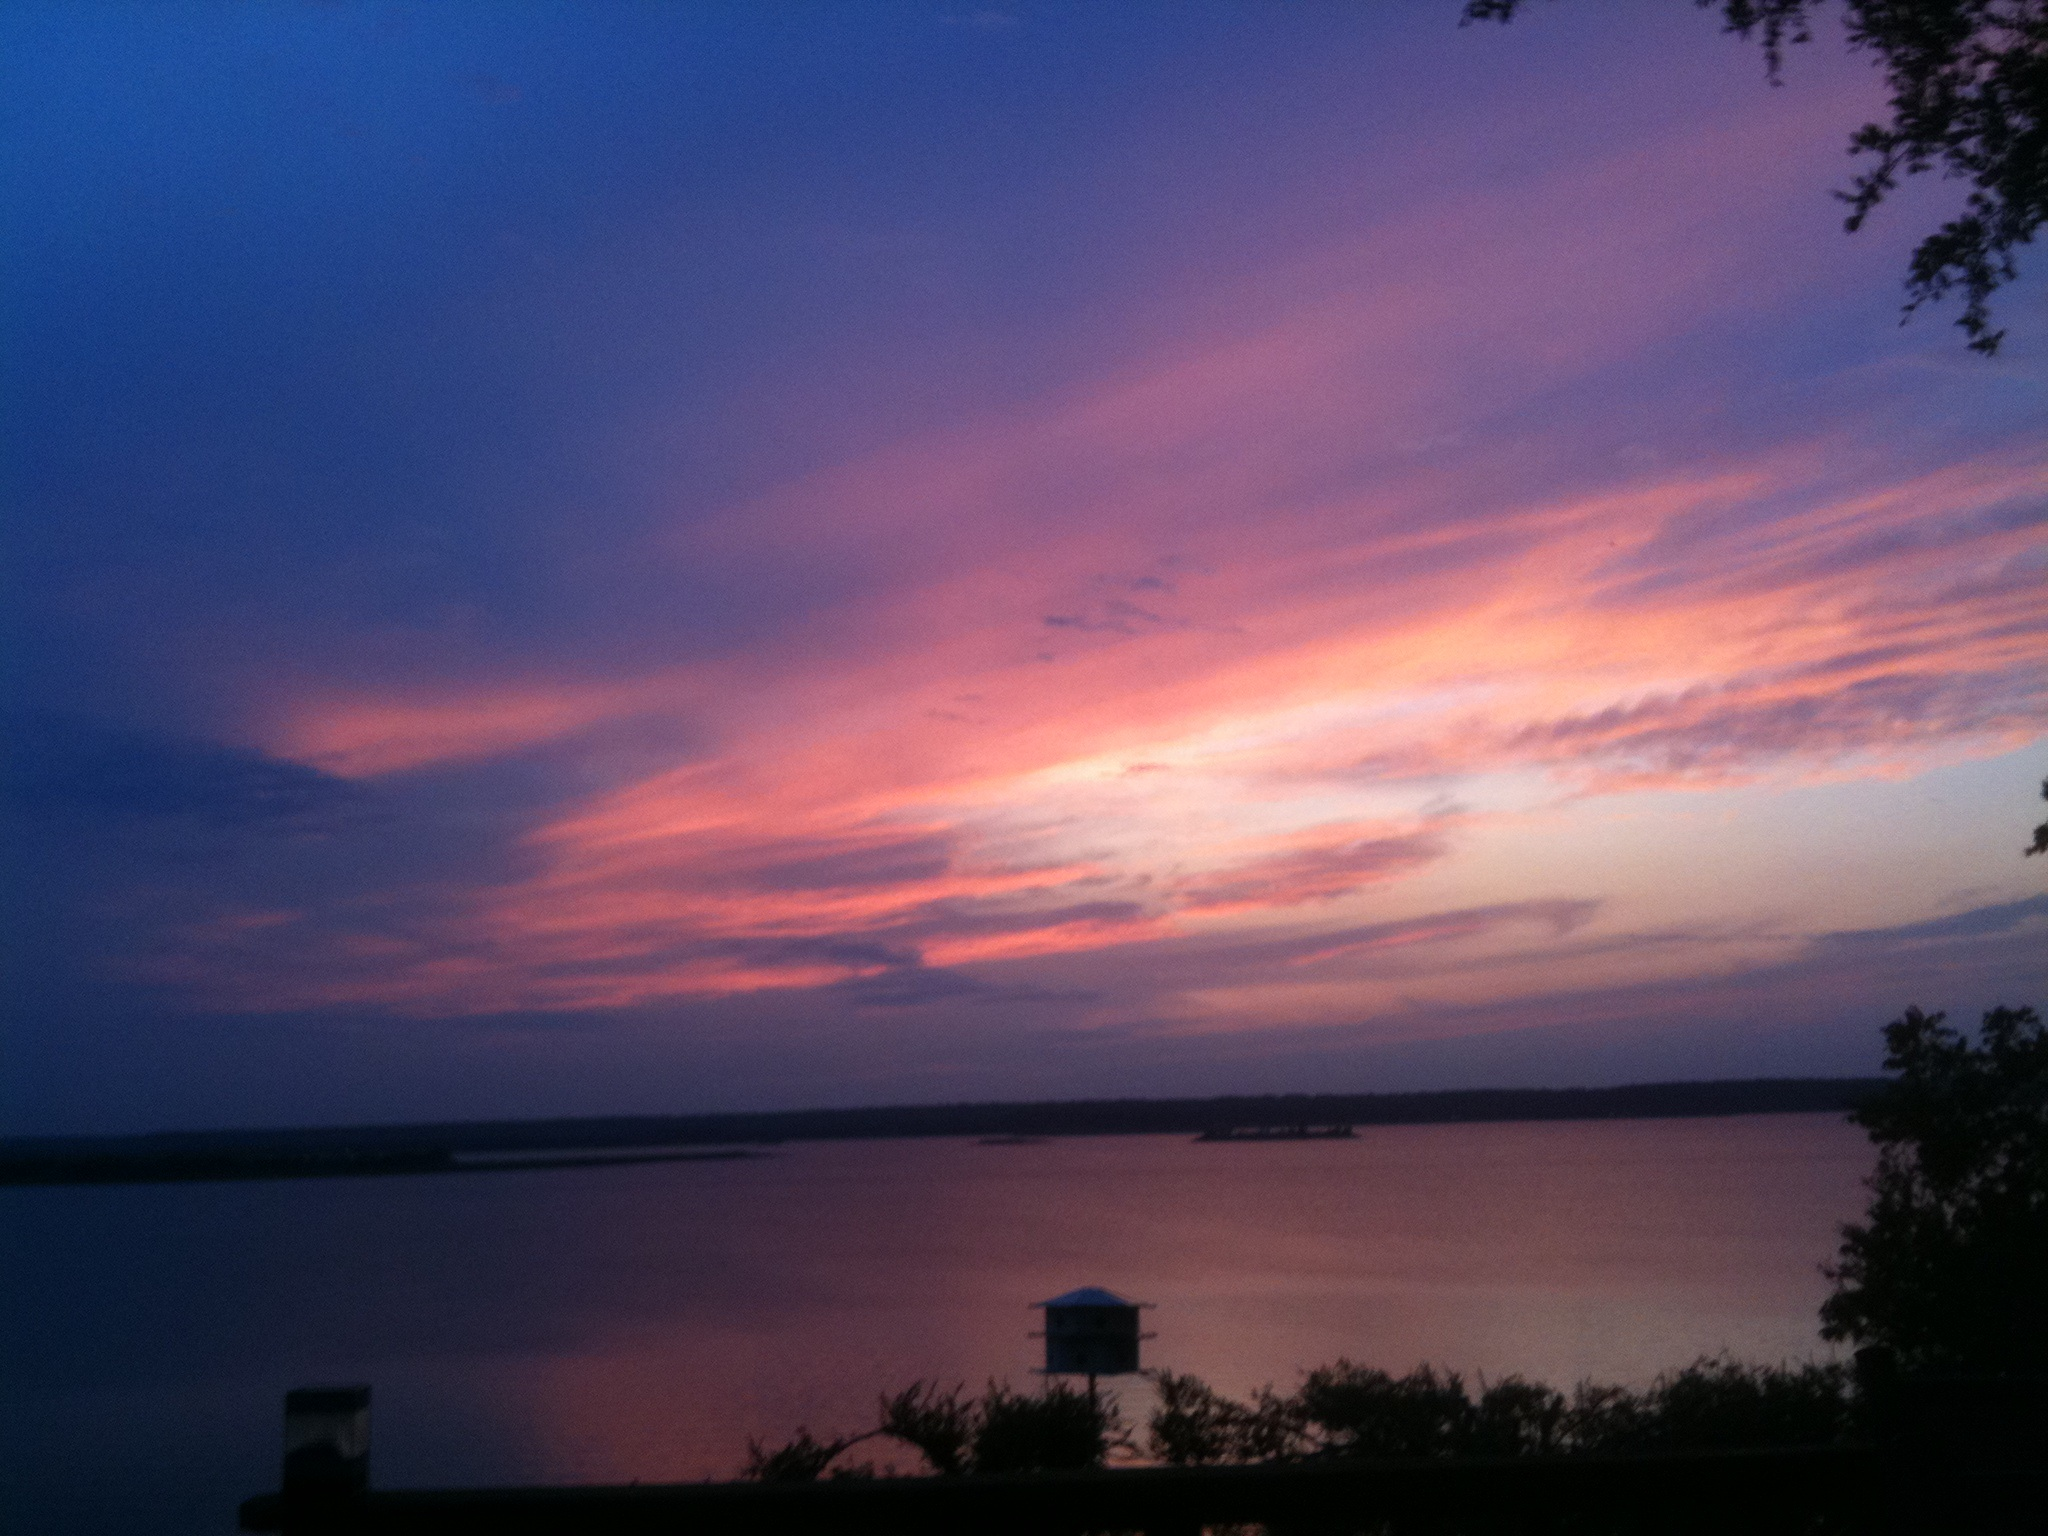 Sunset across Lake Bridgeport